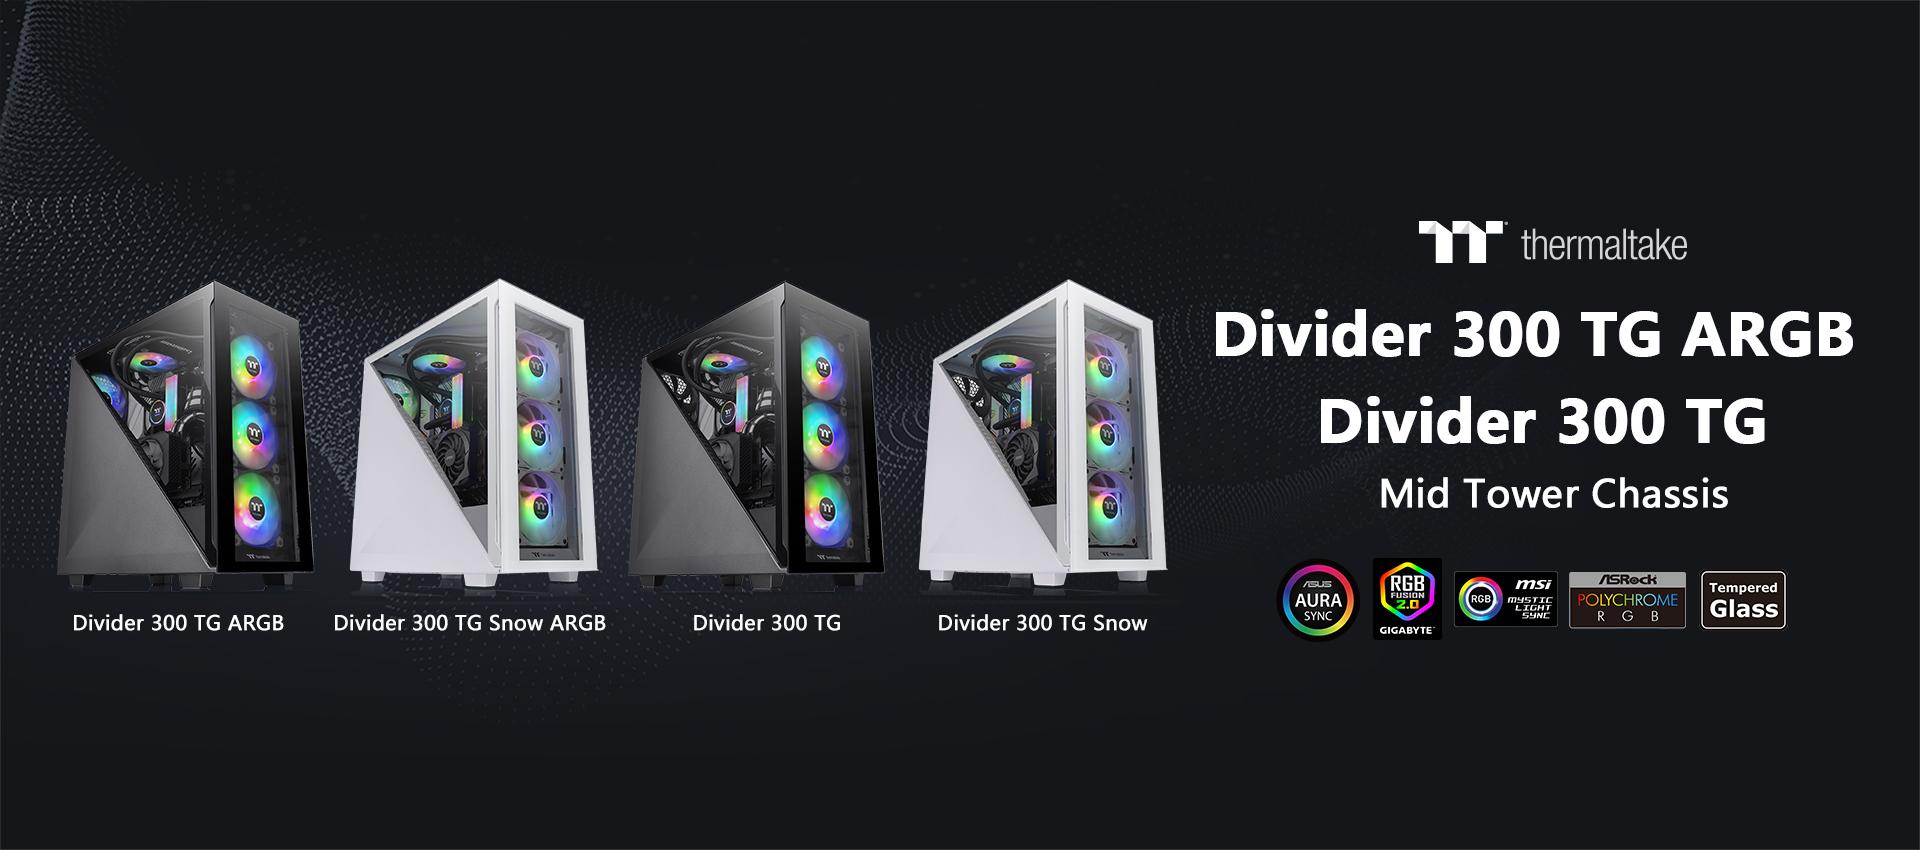 Divider 300 TG